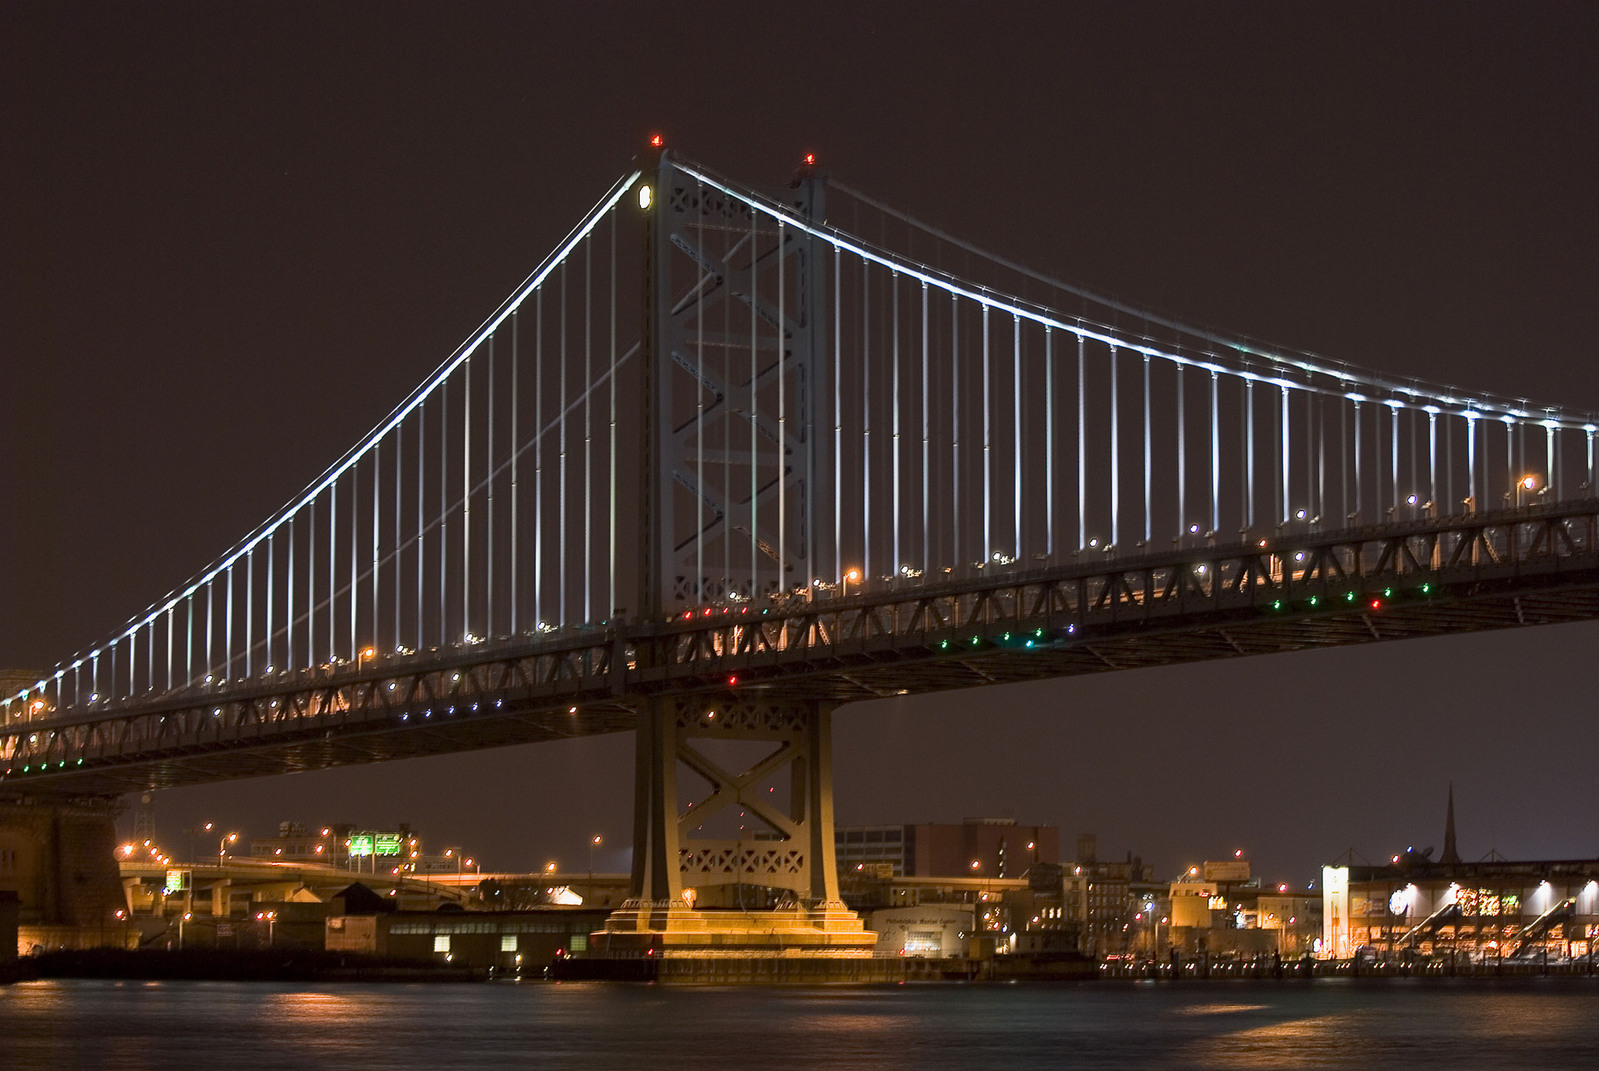 ben-franklin-bridge-1222685-1599x1070.jpg